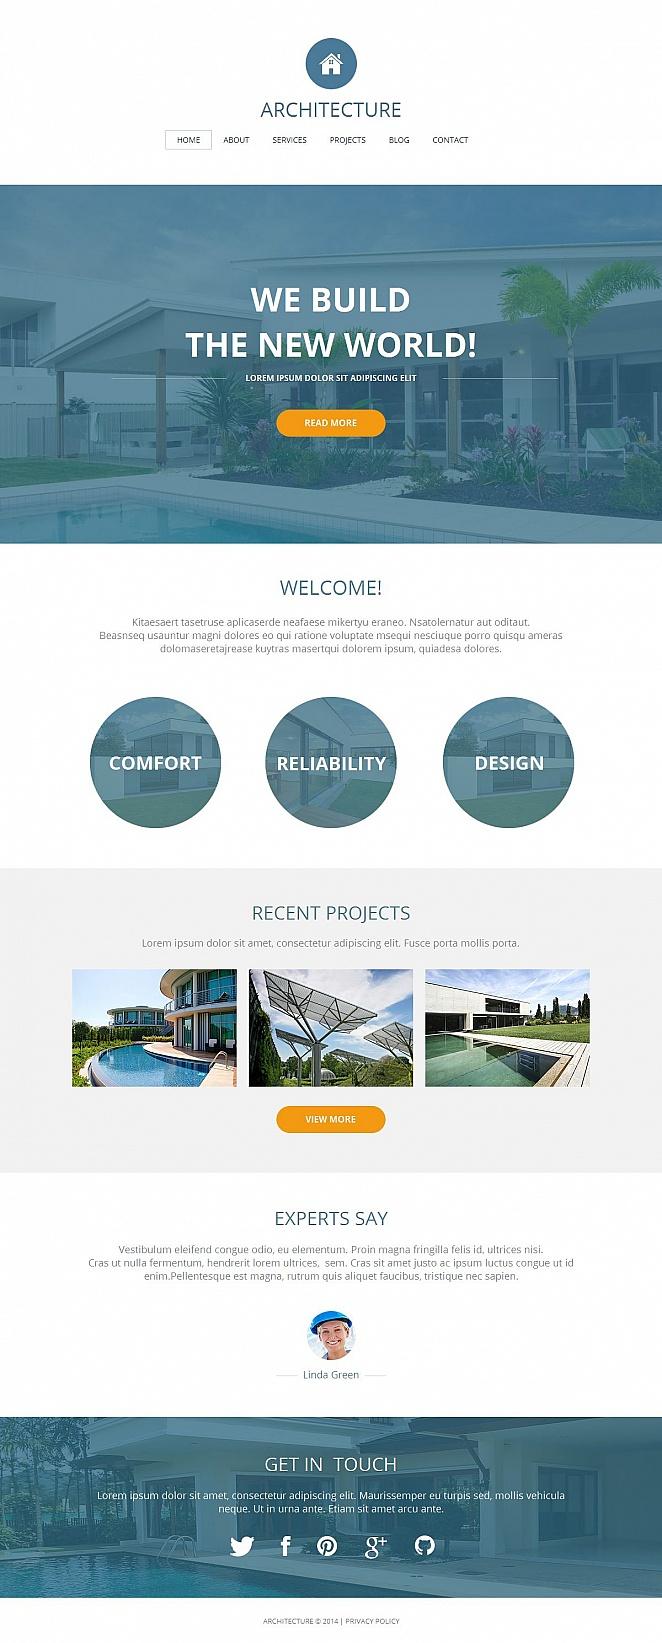 Architecture Portfolio Website Template with White Background - image